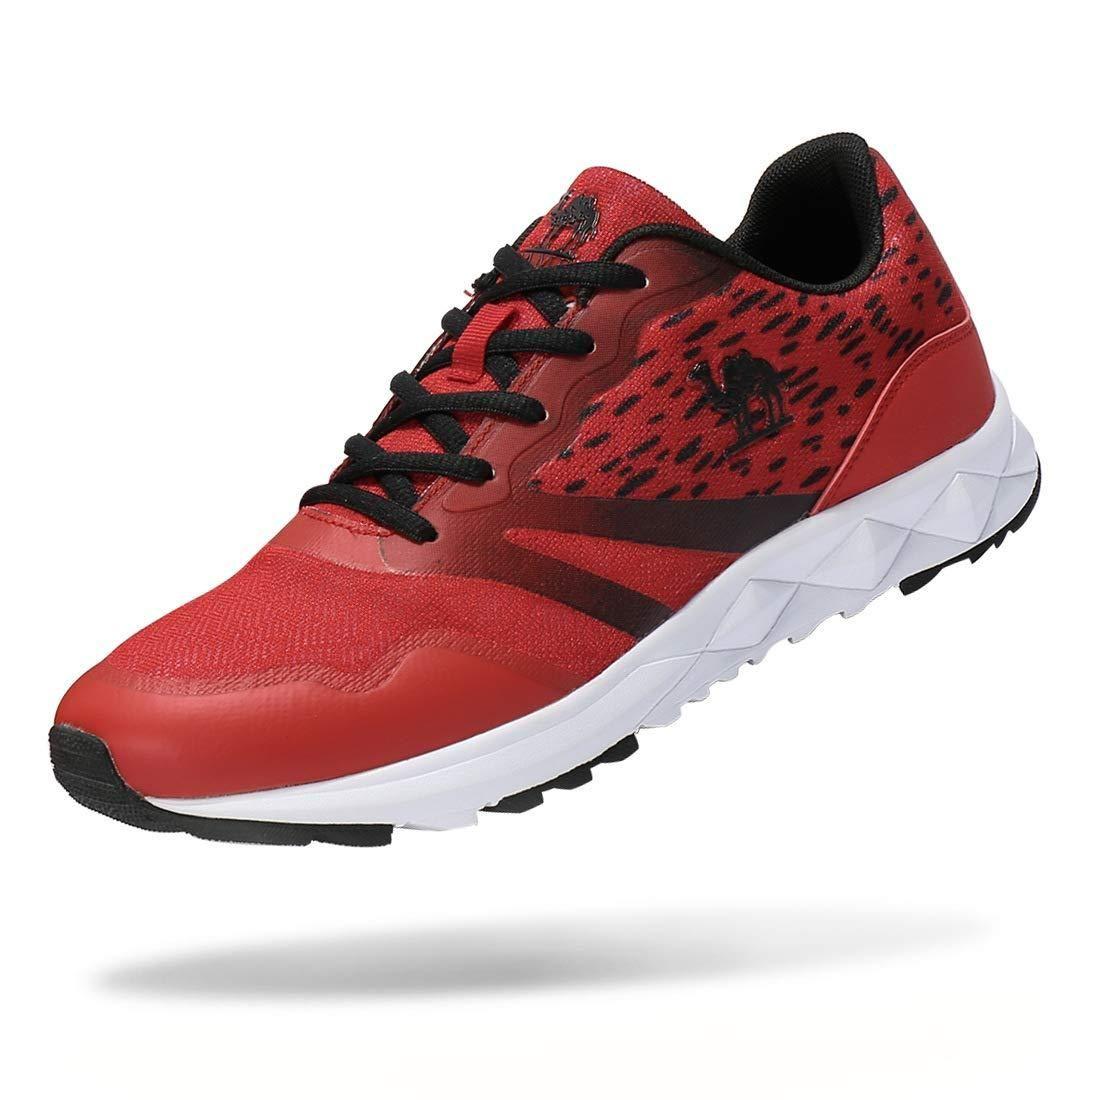 07762ea6f0054 CAMEL CROWN Men/Women's Sport Running Shoes Lightweight Walking ...